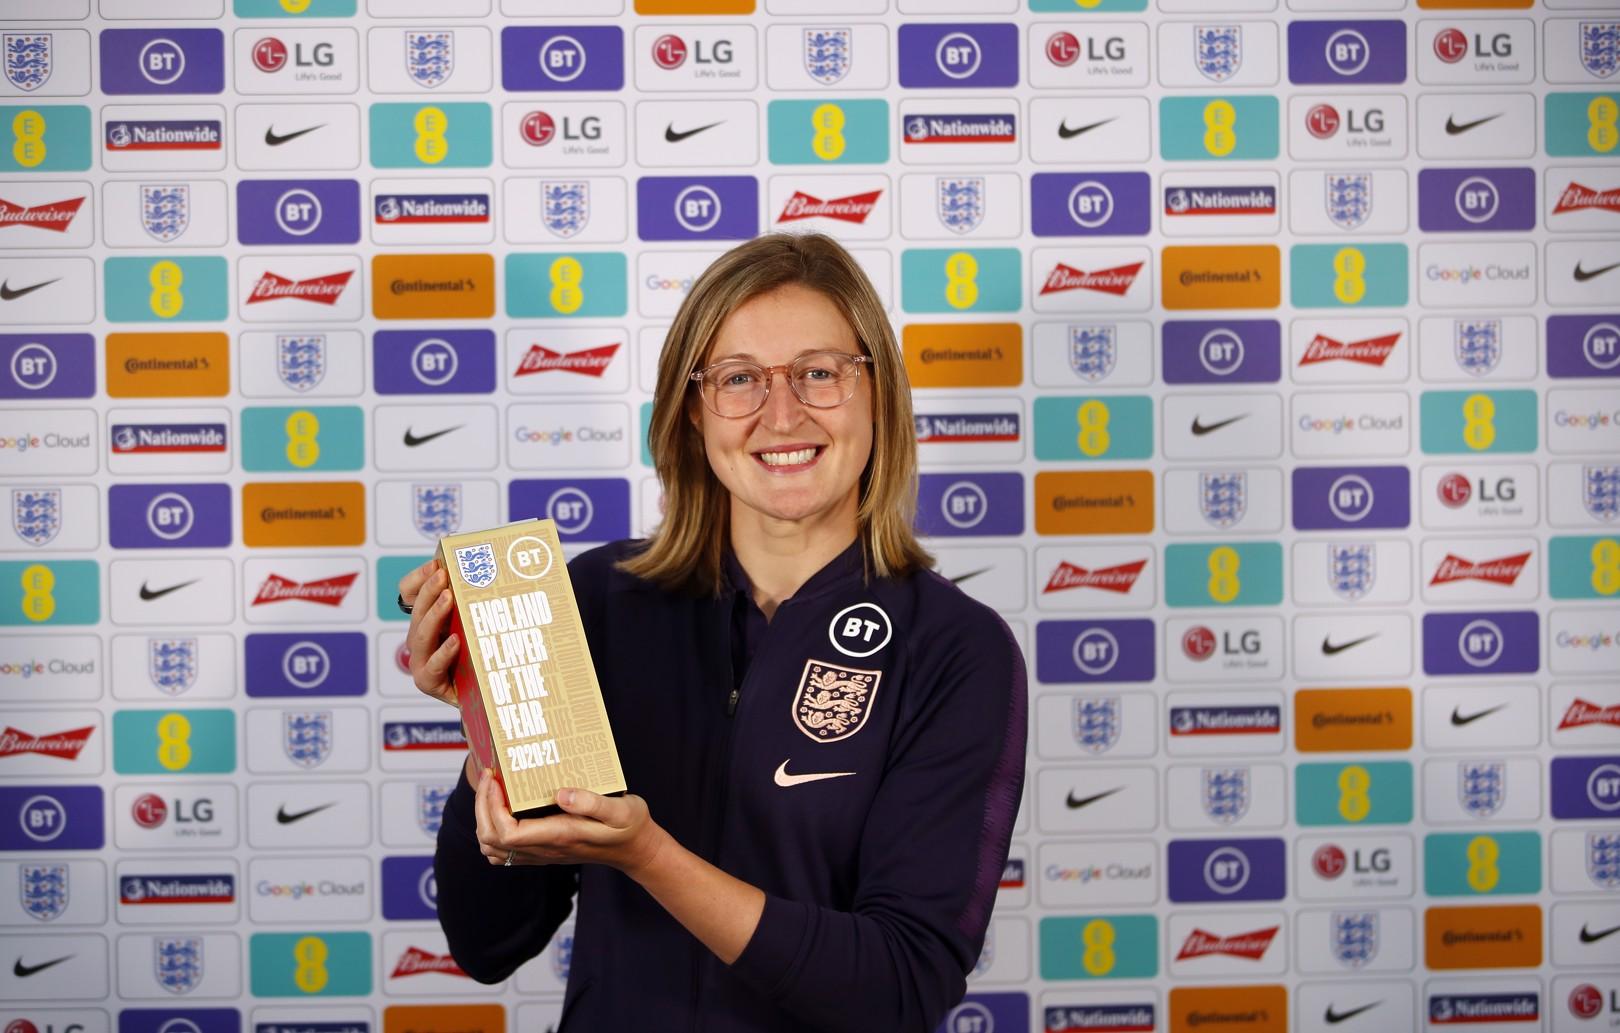 Ellen White voted BT England Women's Player of the Year